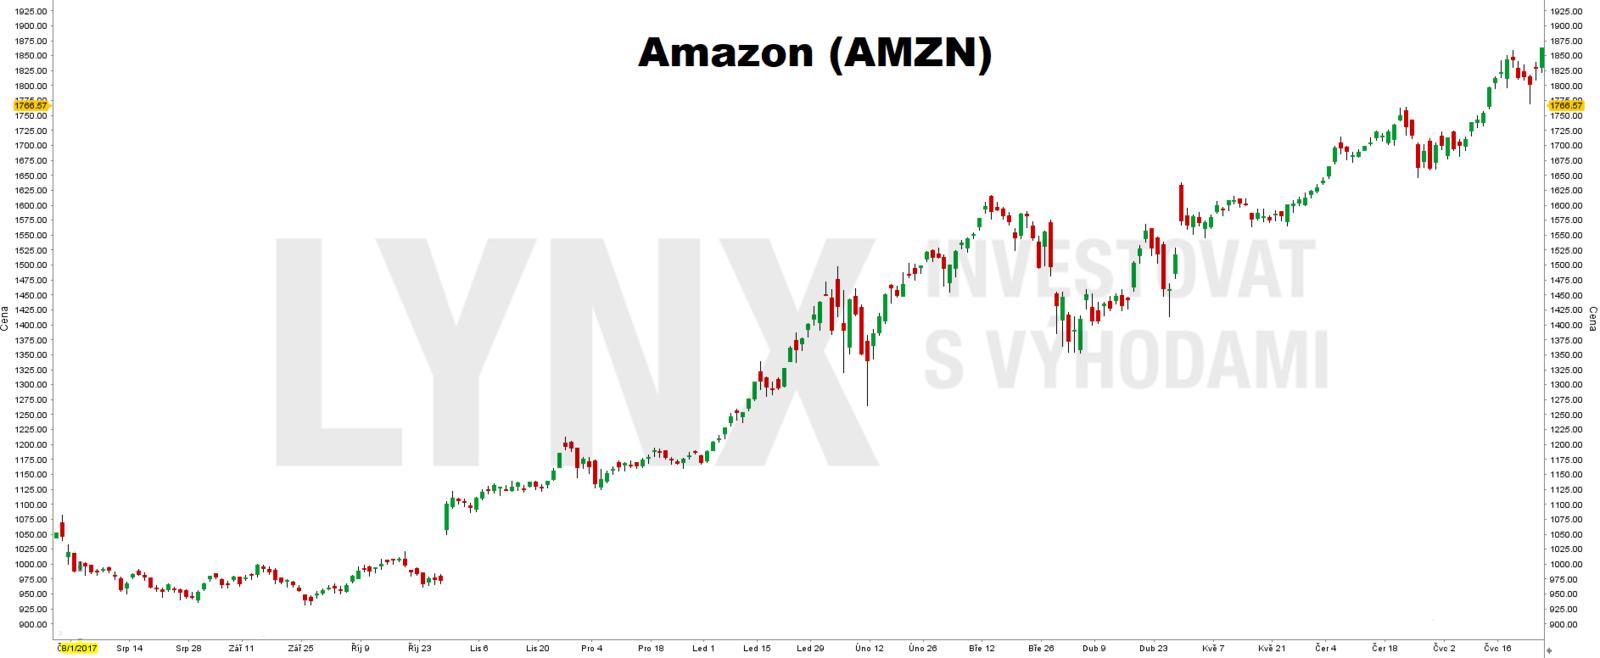 Akcie Amazon (AMZN) - roční timeframe